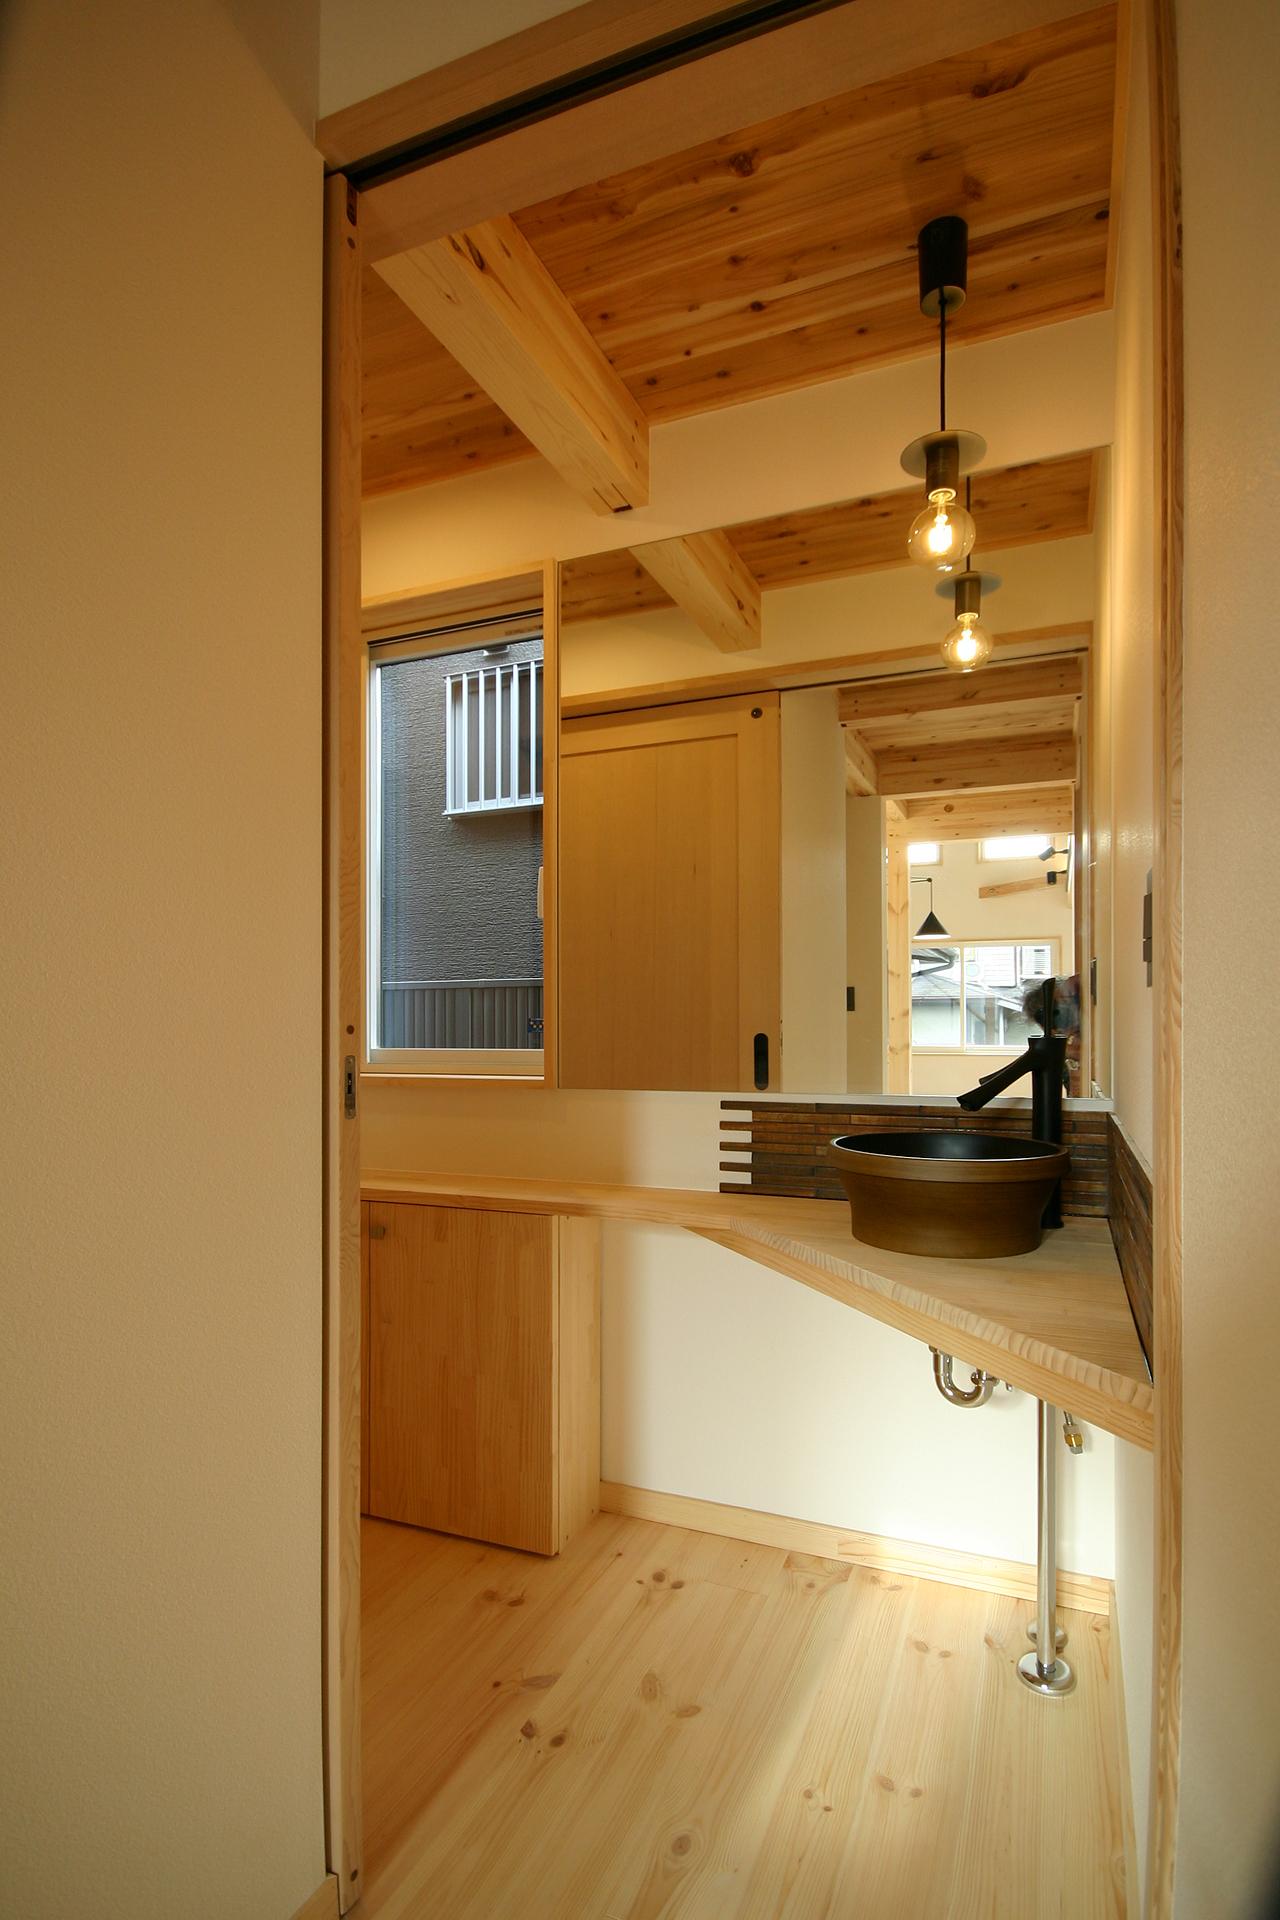 【予約制】自宅キッチンで料理教室 完成見楽会 筑西市|注文住宅 LOAFER